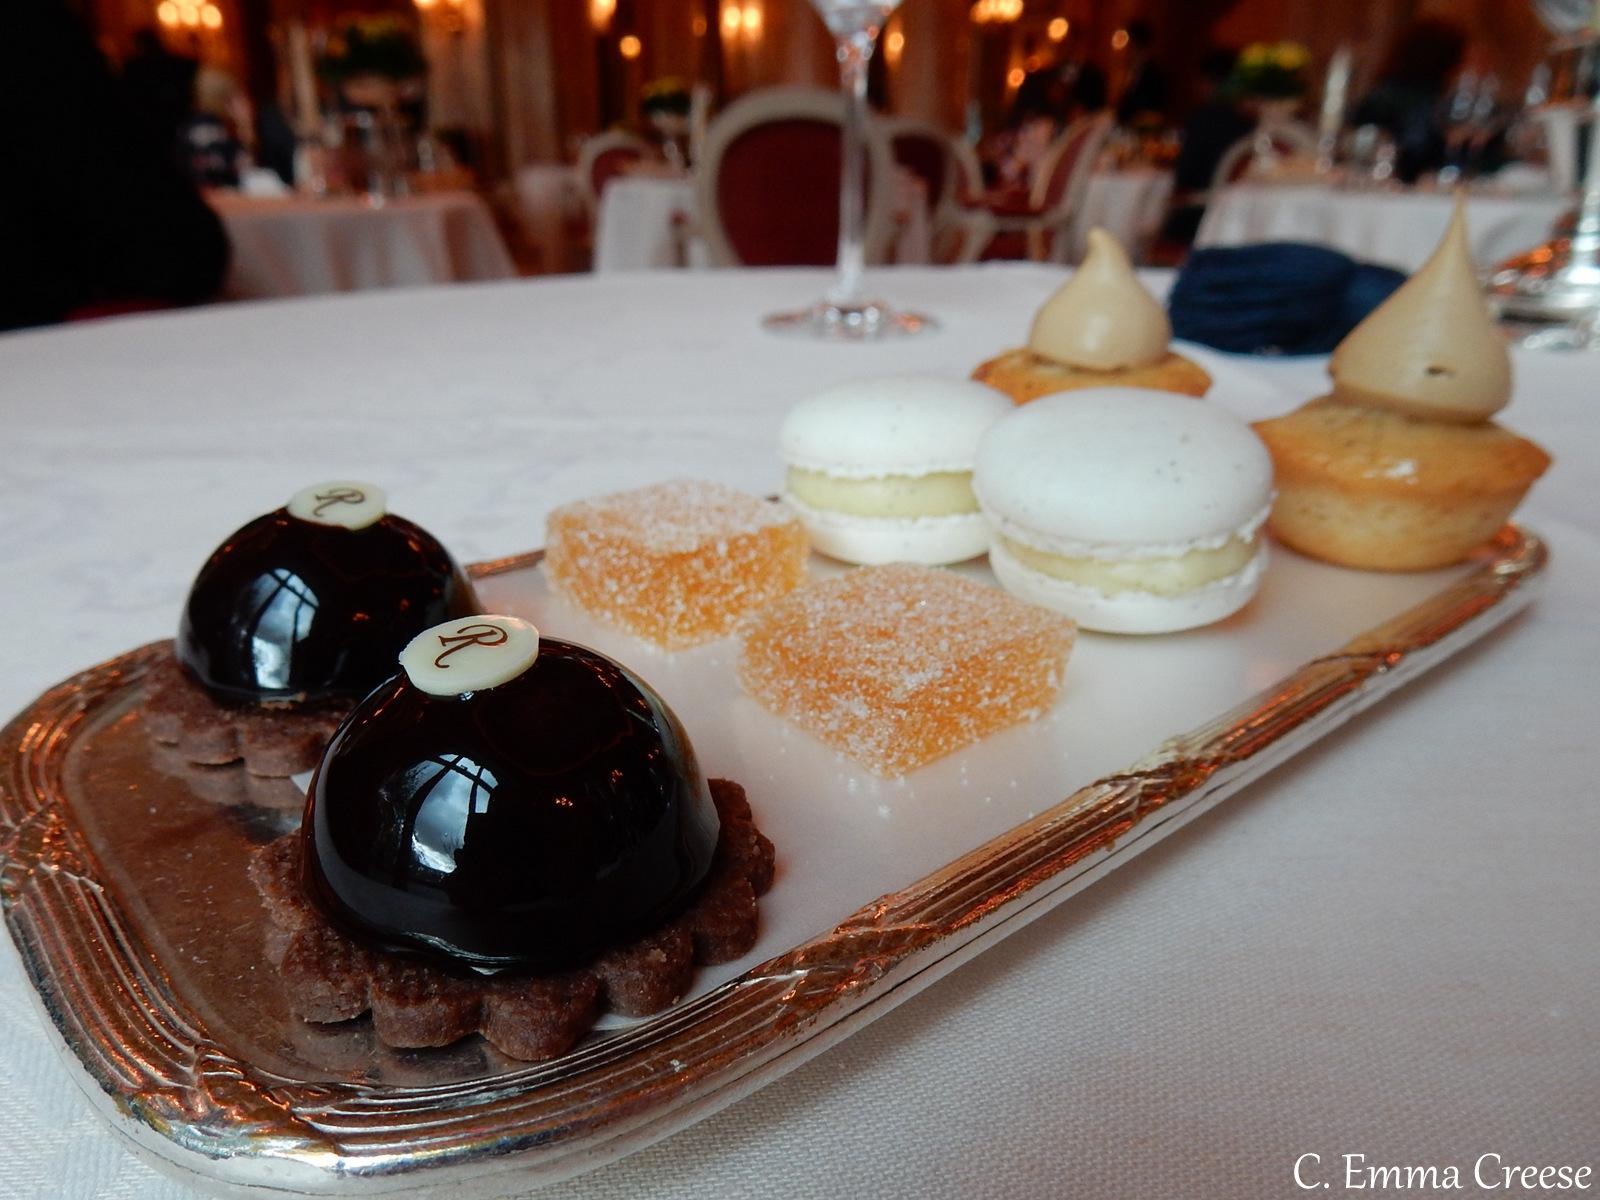 Restaurant Review The Ritz Luxury London Adventures of a London Kiwi